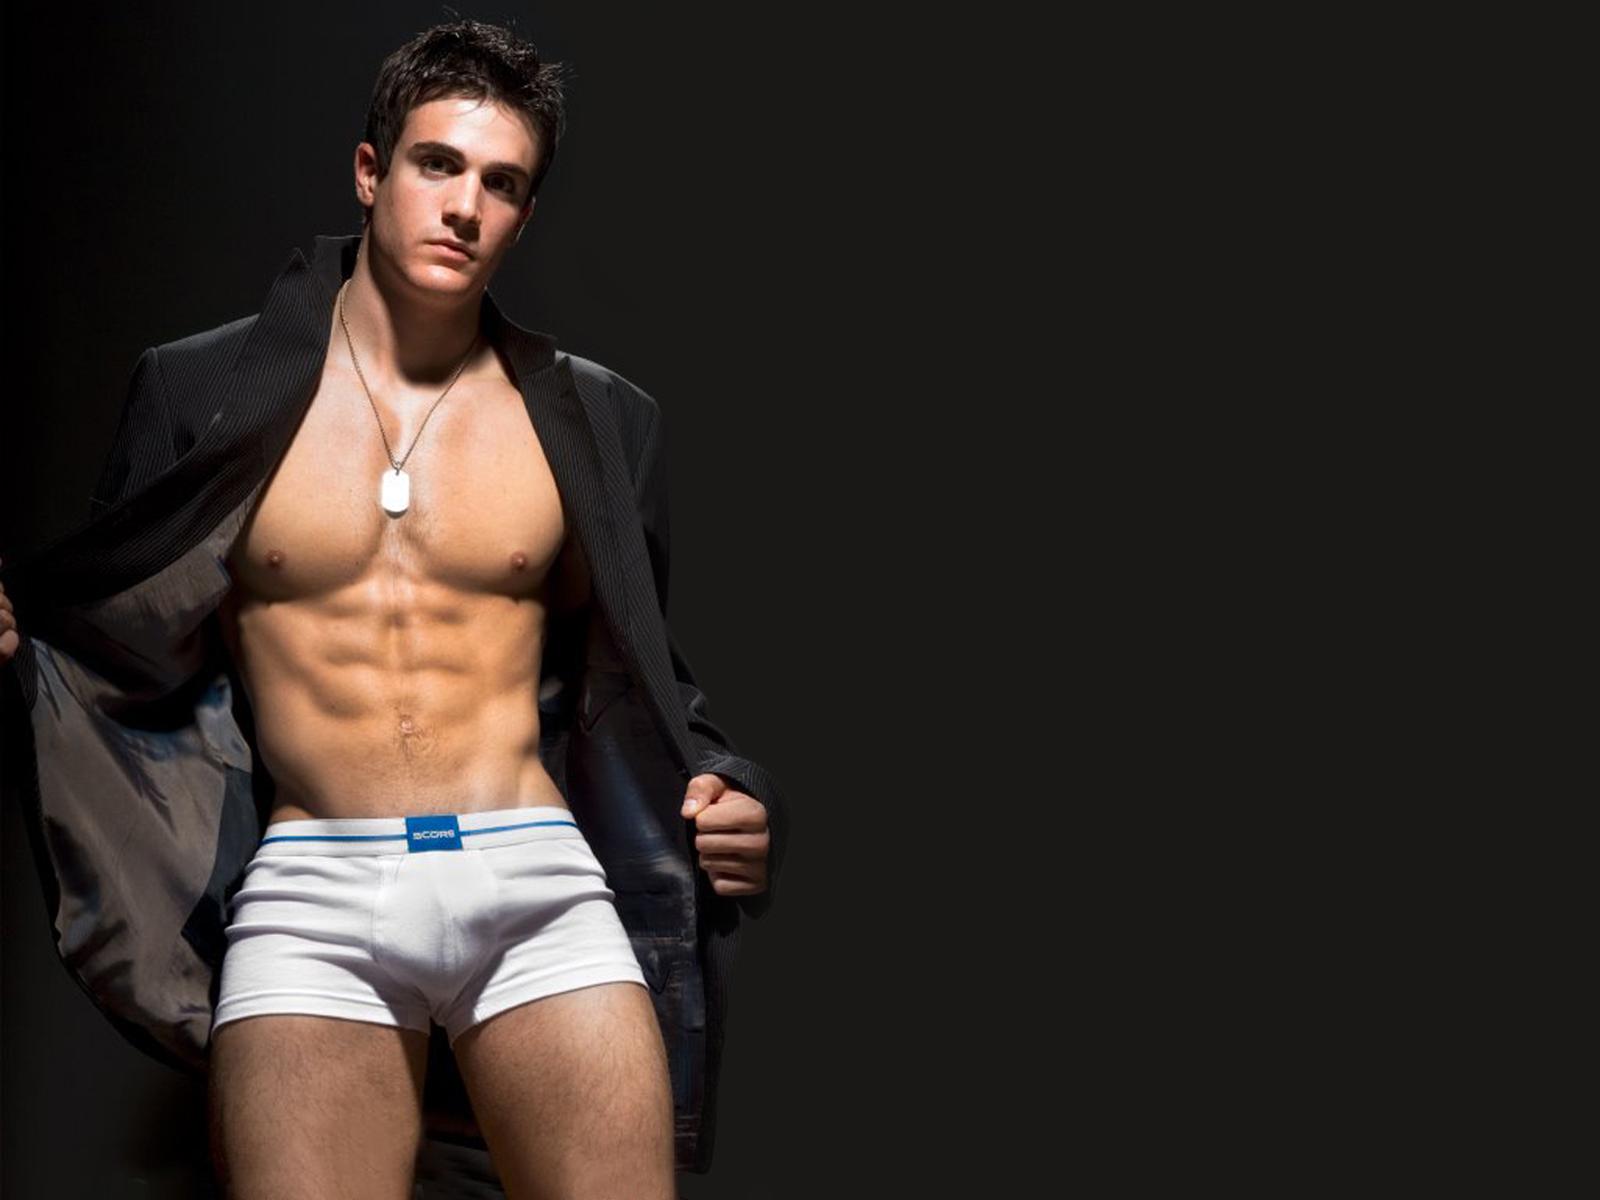 gay men in lingerie